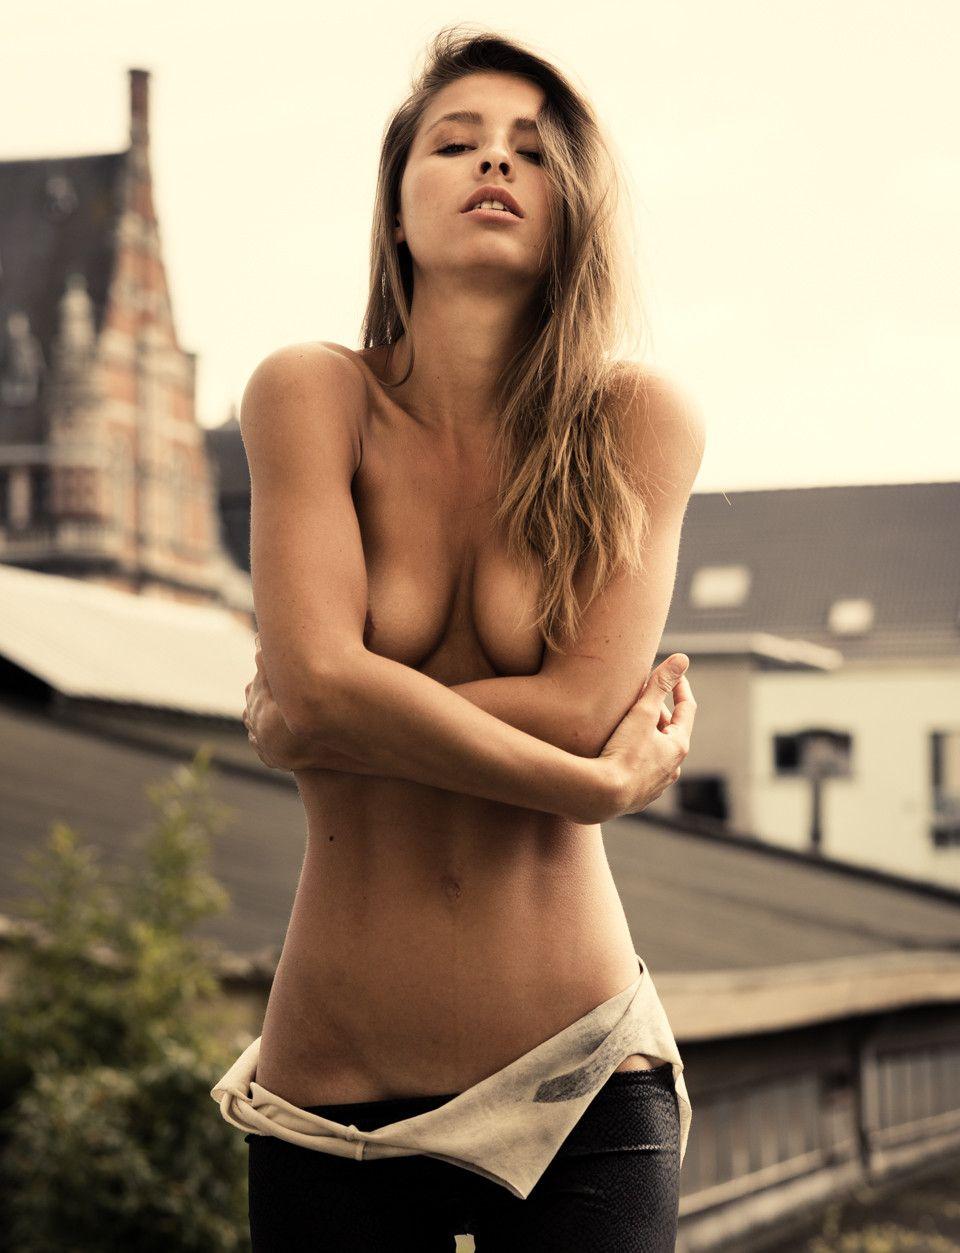 Marisa-Papen-Topless-12